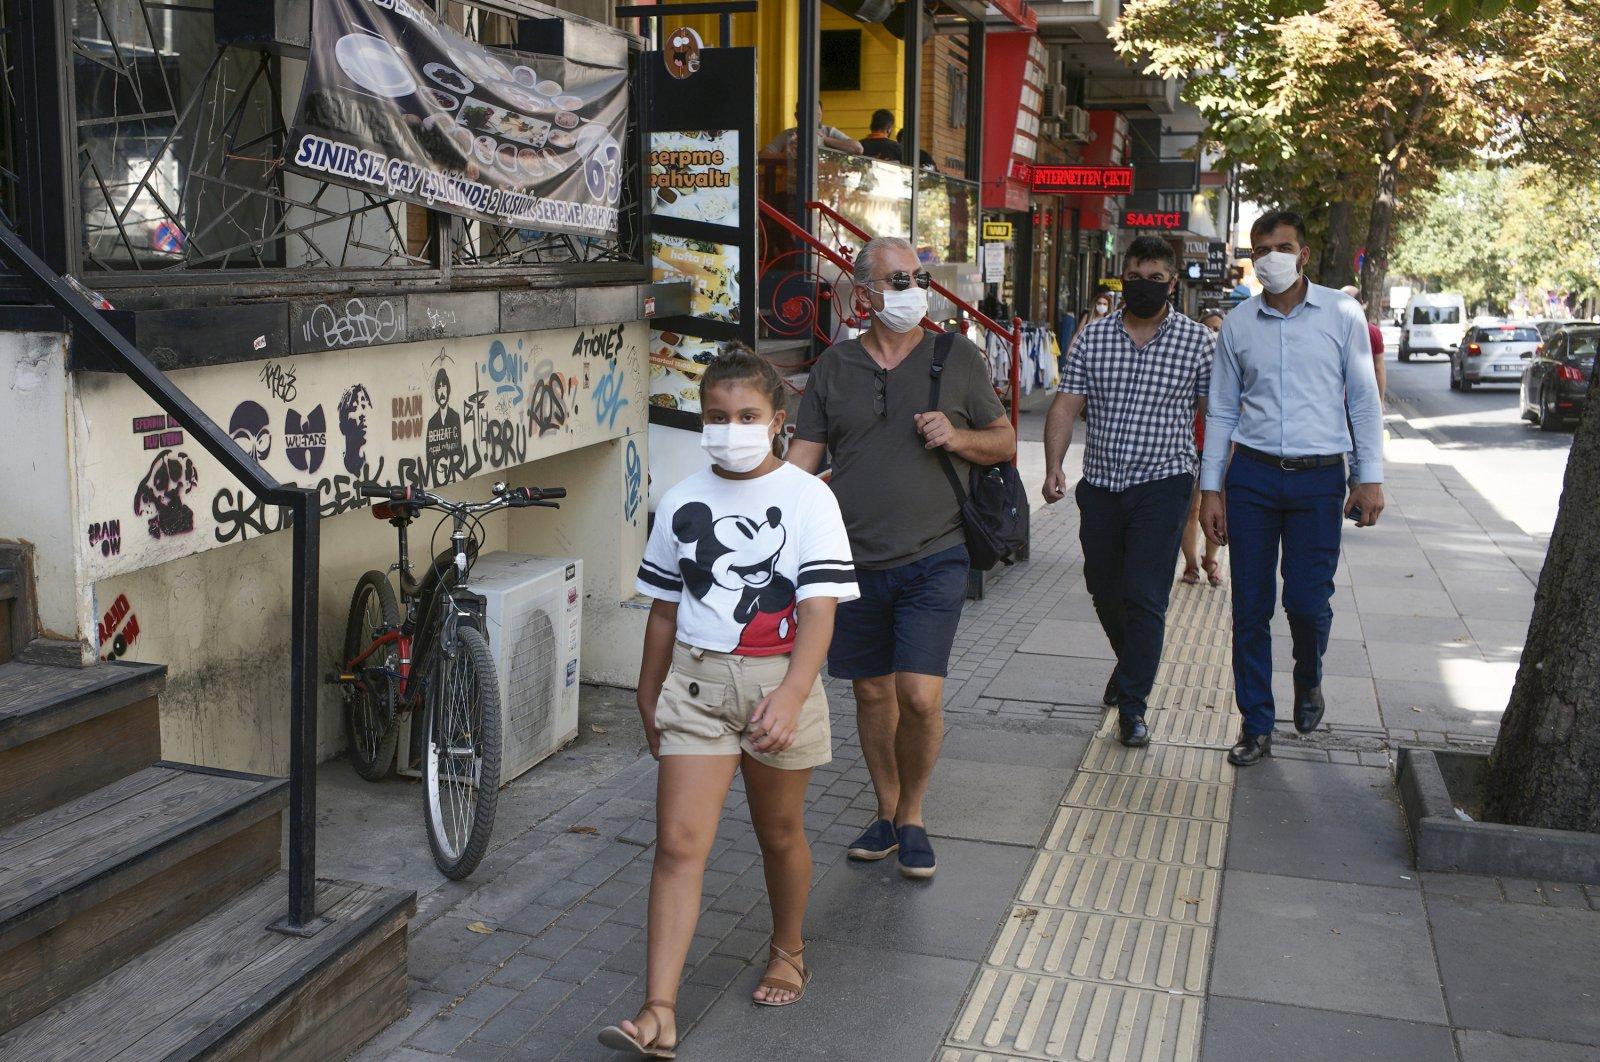 People walk along a street in Ankara, Turkey, Wednesday, Sept. 2, 2020. (AP Photo)